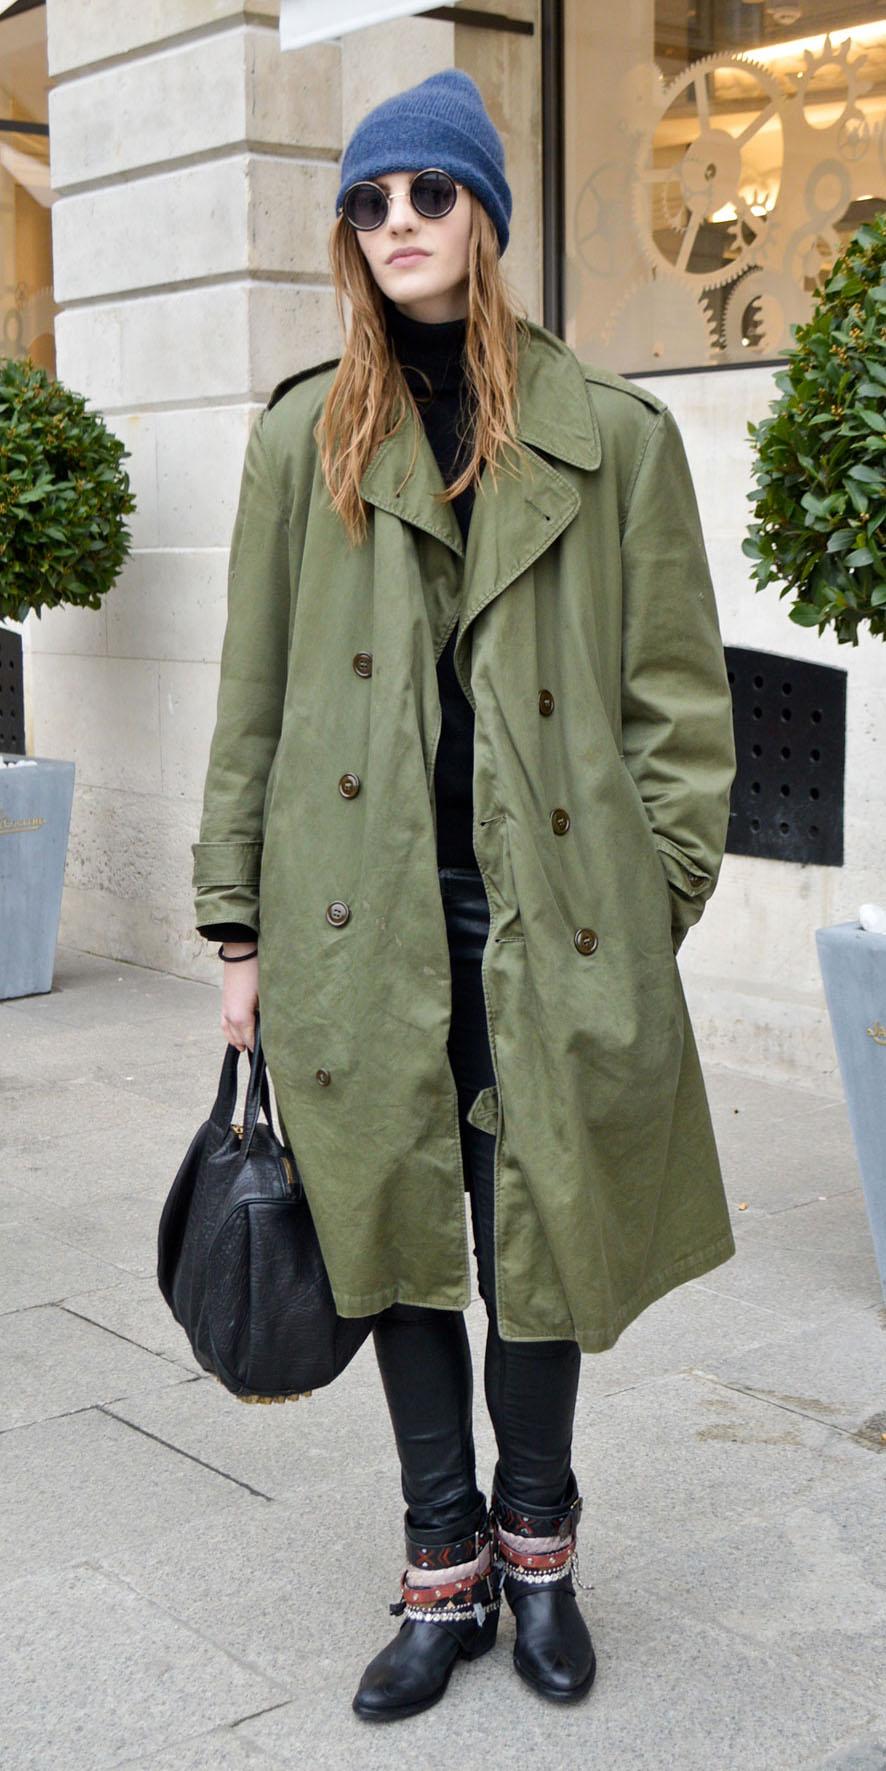 black-skinny-jeans-black-bag-beanie-sun-hairr-black-shoe-booties-green-olive-jacket-coat-trench-fall-winter-weekend.jpg